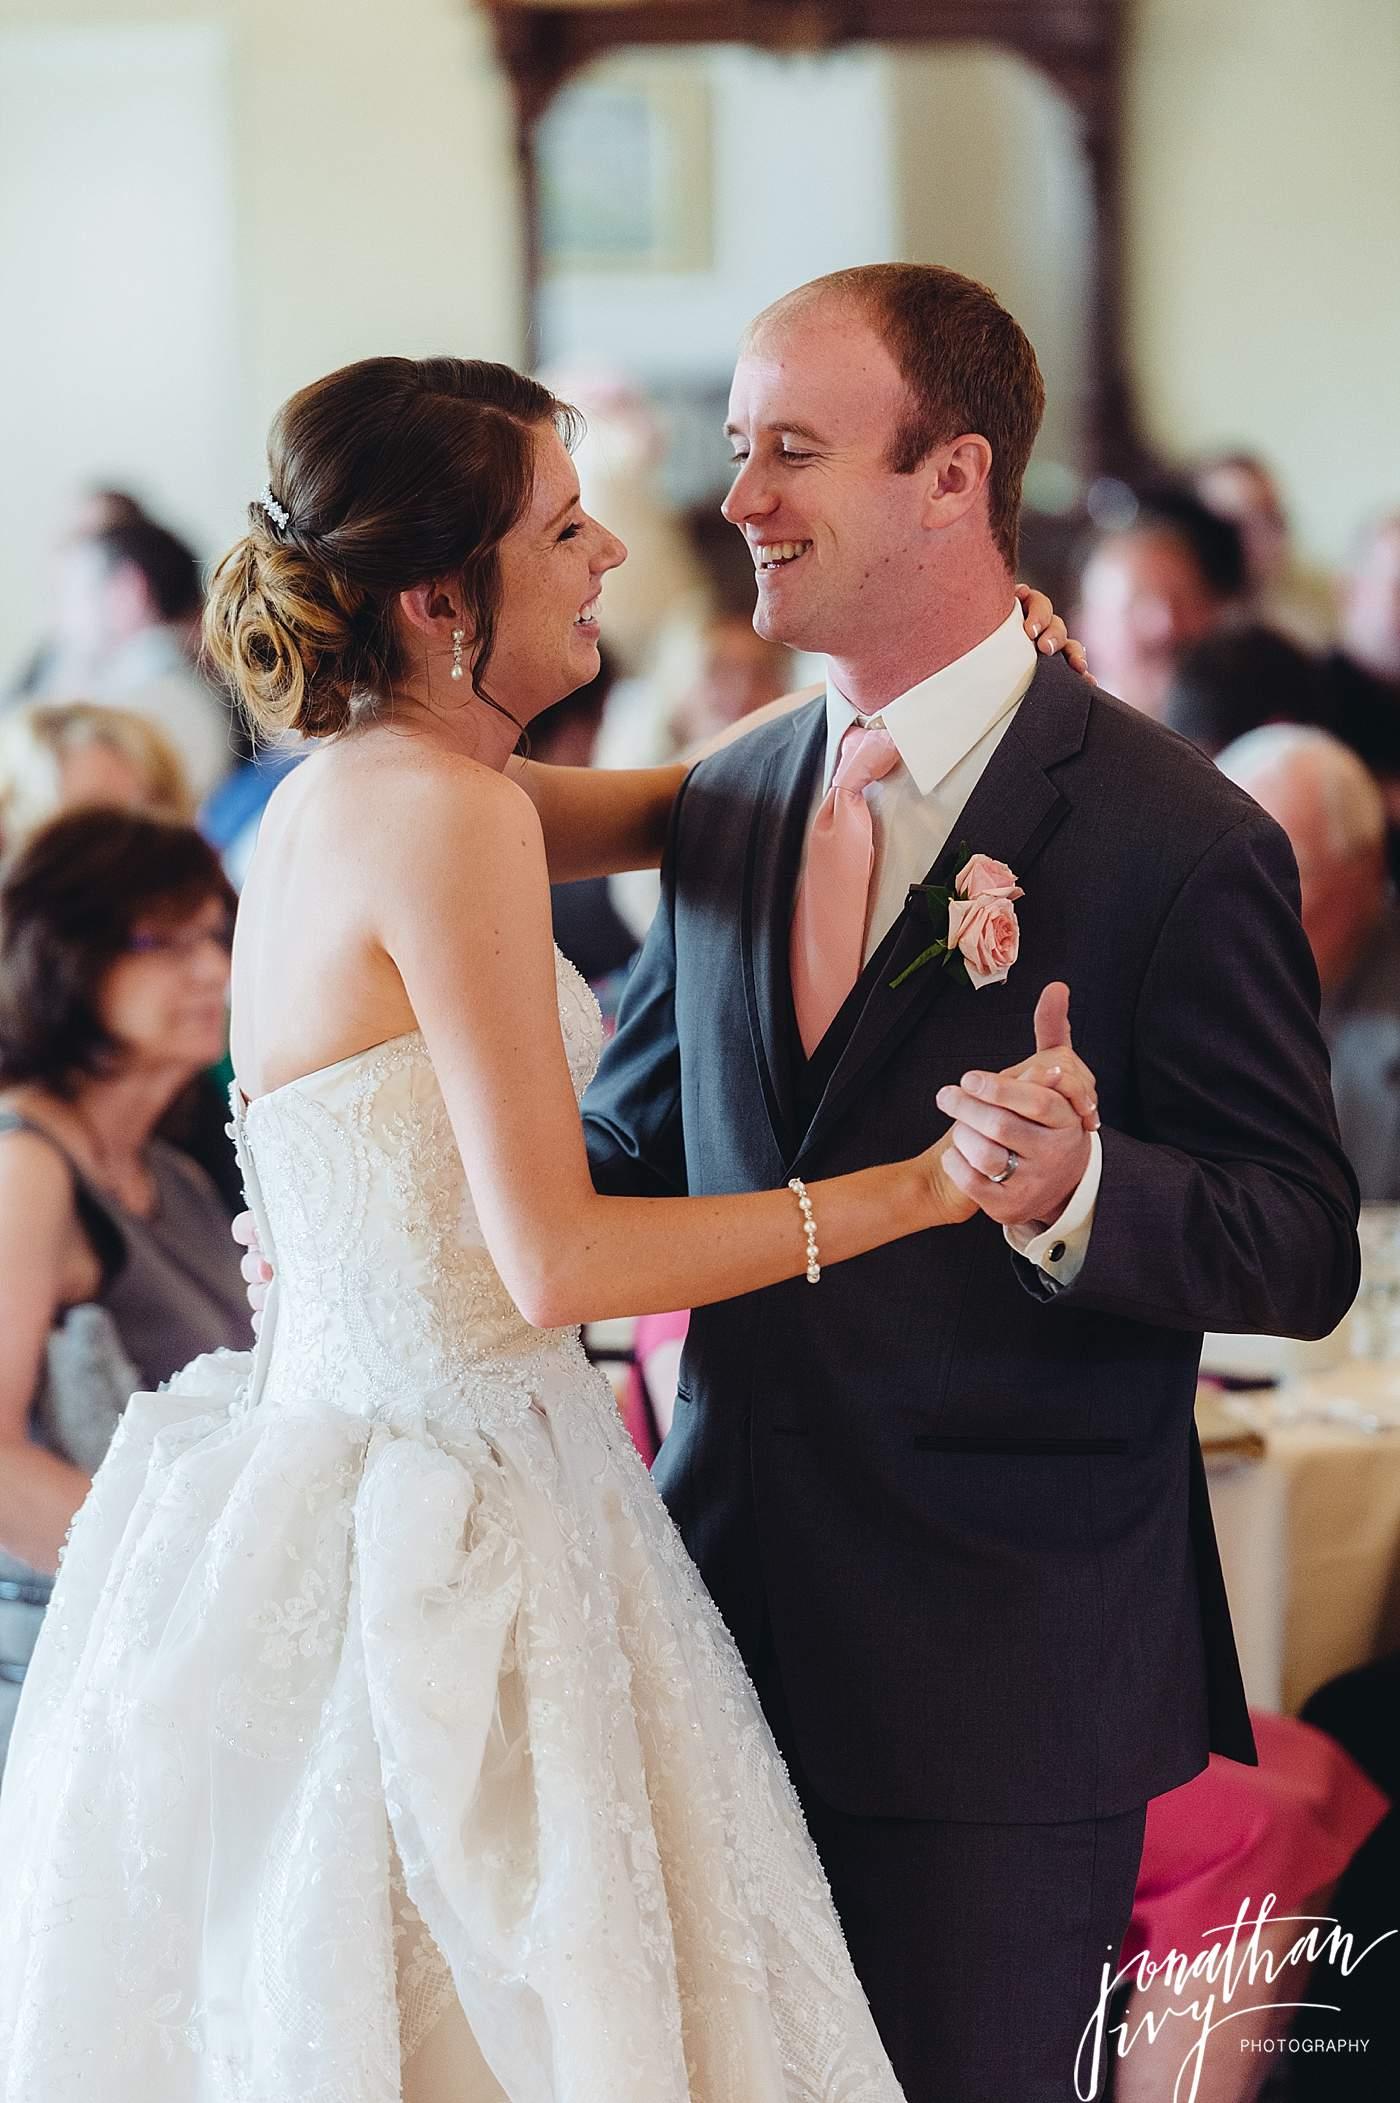 Austin Wedding,Austin Wedding Photographer,Houston Wedding Photographer,The Woodlands Wedding Photographer,